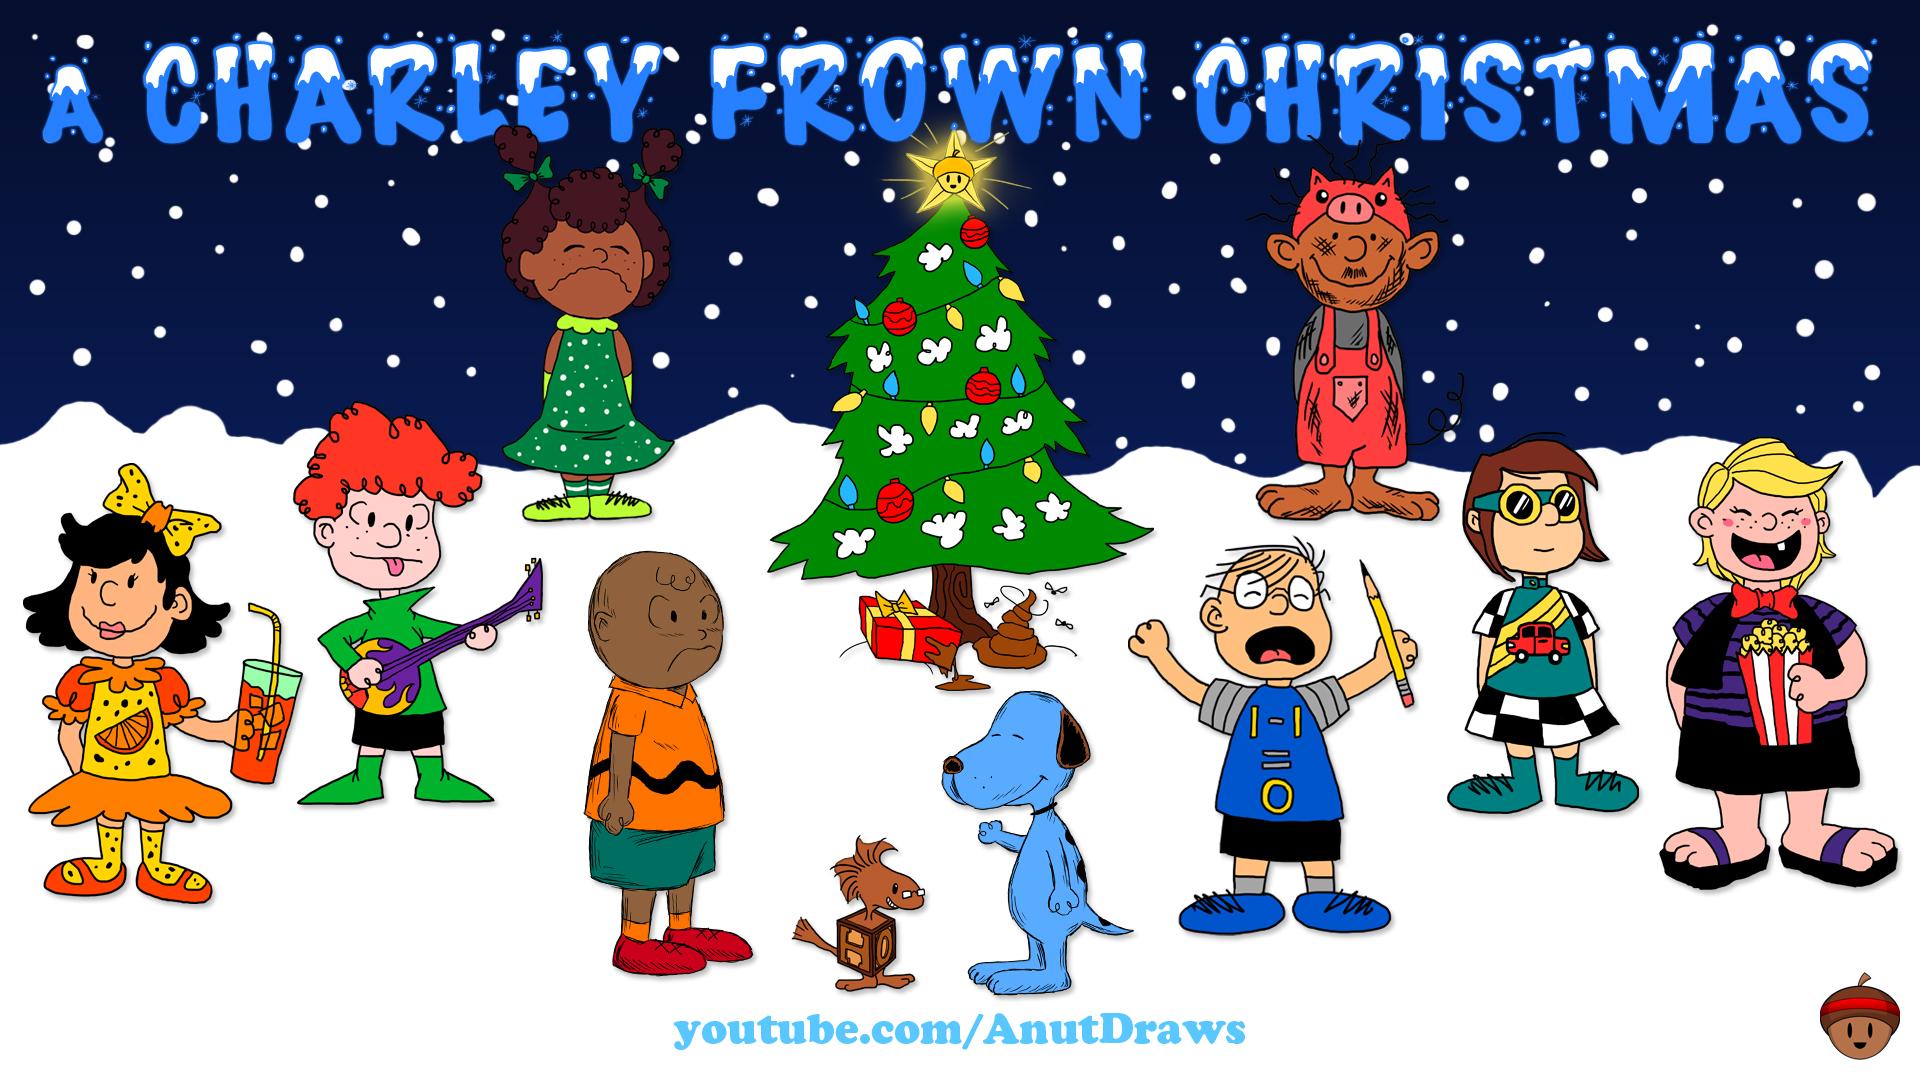 Charlie Brown Christmas Computer Wallpapers Desktop Backgrounds 1920x1080